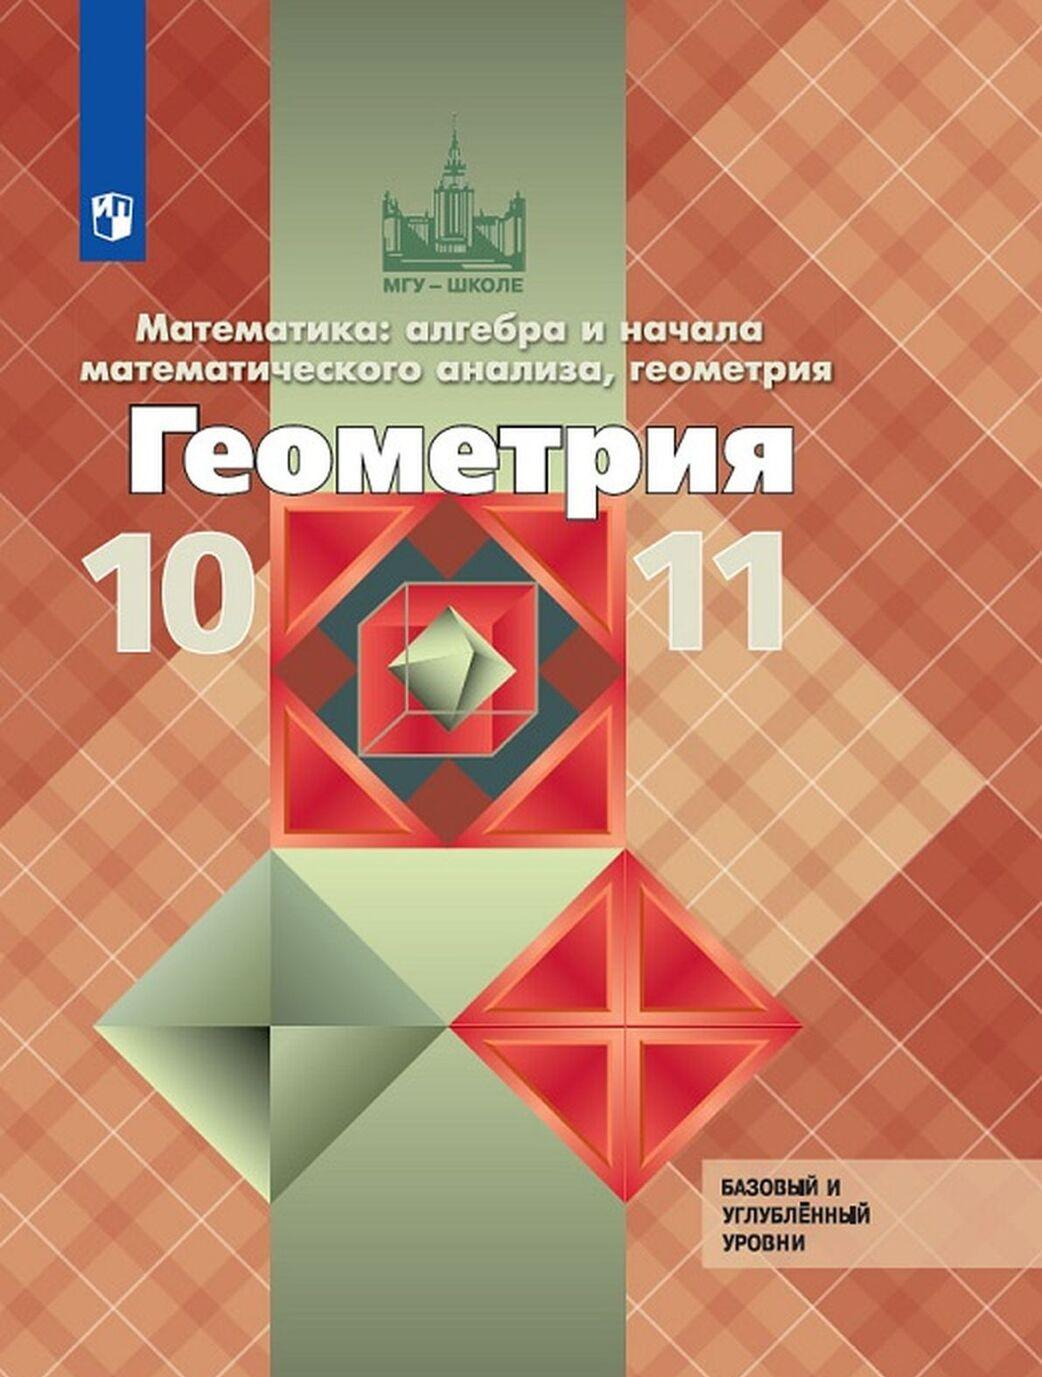 Geometrija. 10-11 klassy. Uchebnik